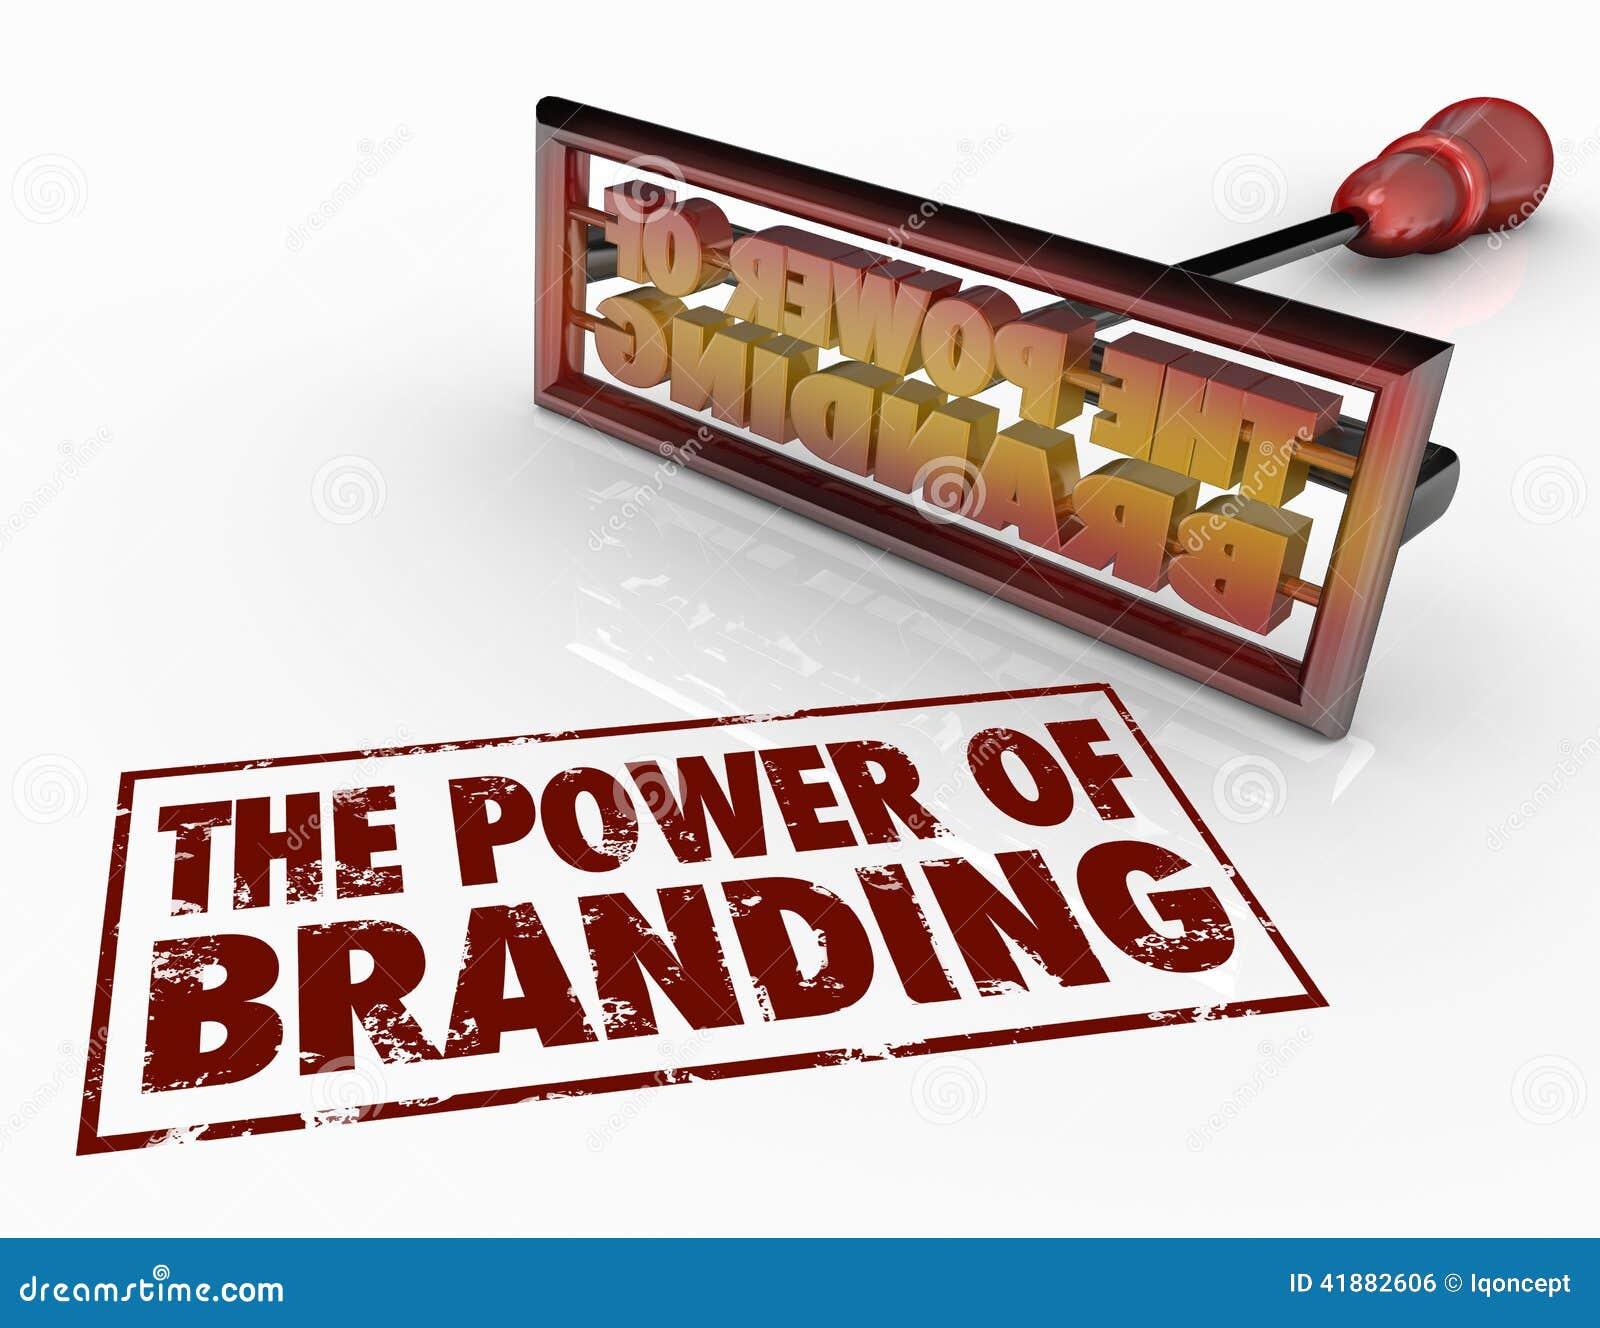 Branding Iron Logo Design